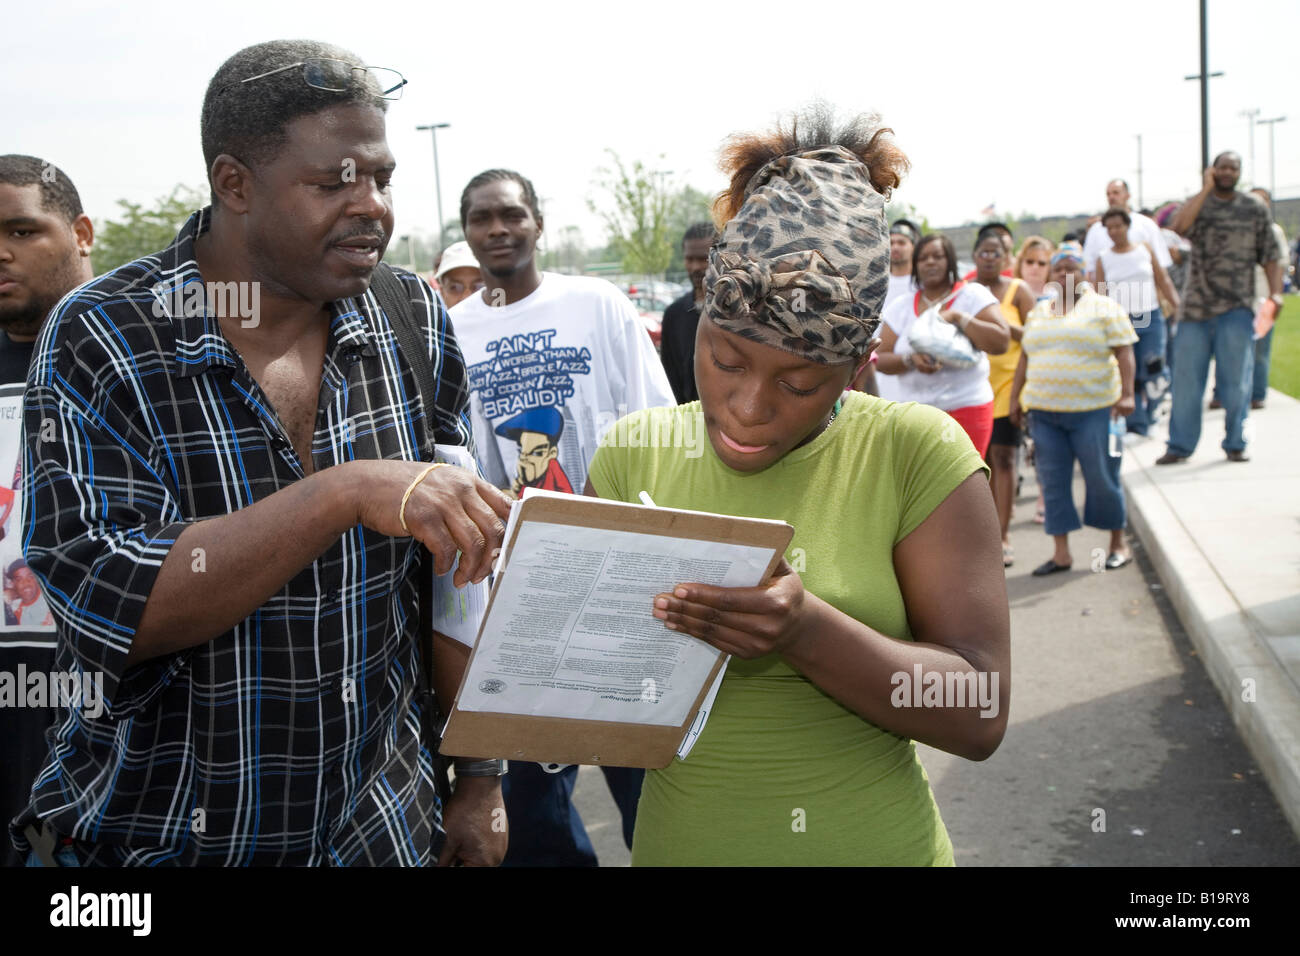 Voter Registration - Stock Image